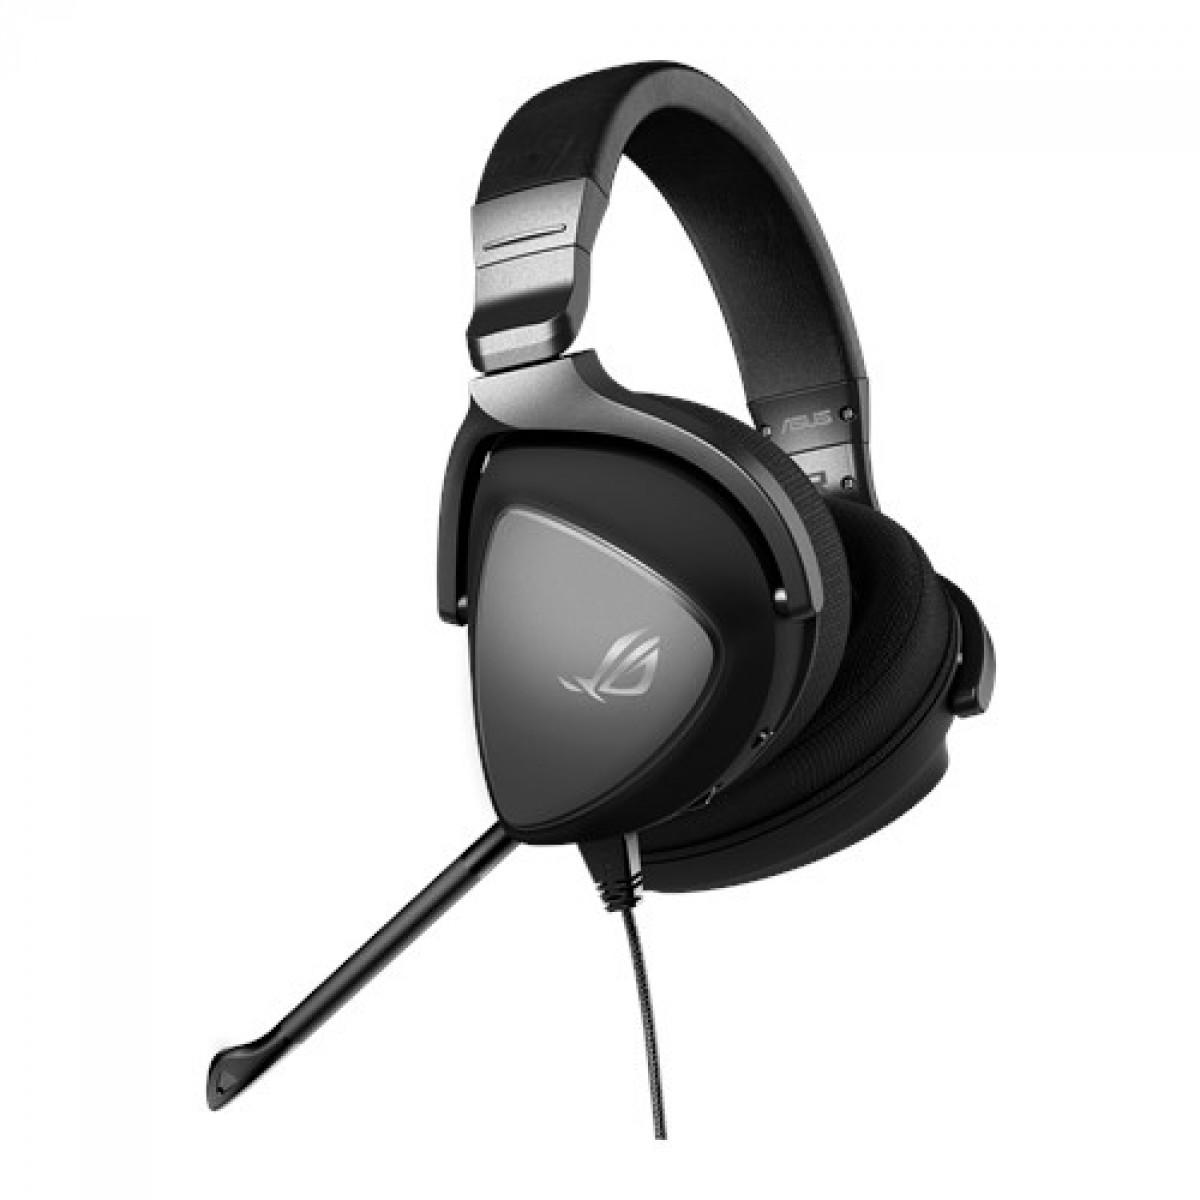 Headset Gamer Asus, ROG Delta Core, 3.5mm, Black, 90YH00Z1-B1UA00, Open Box